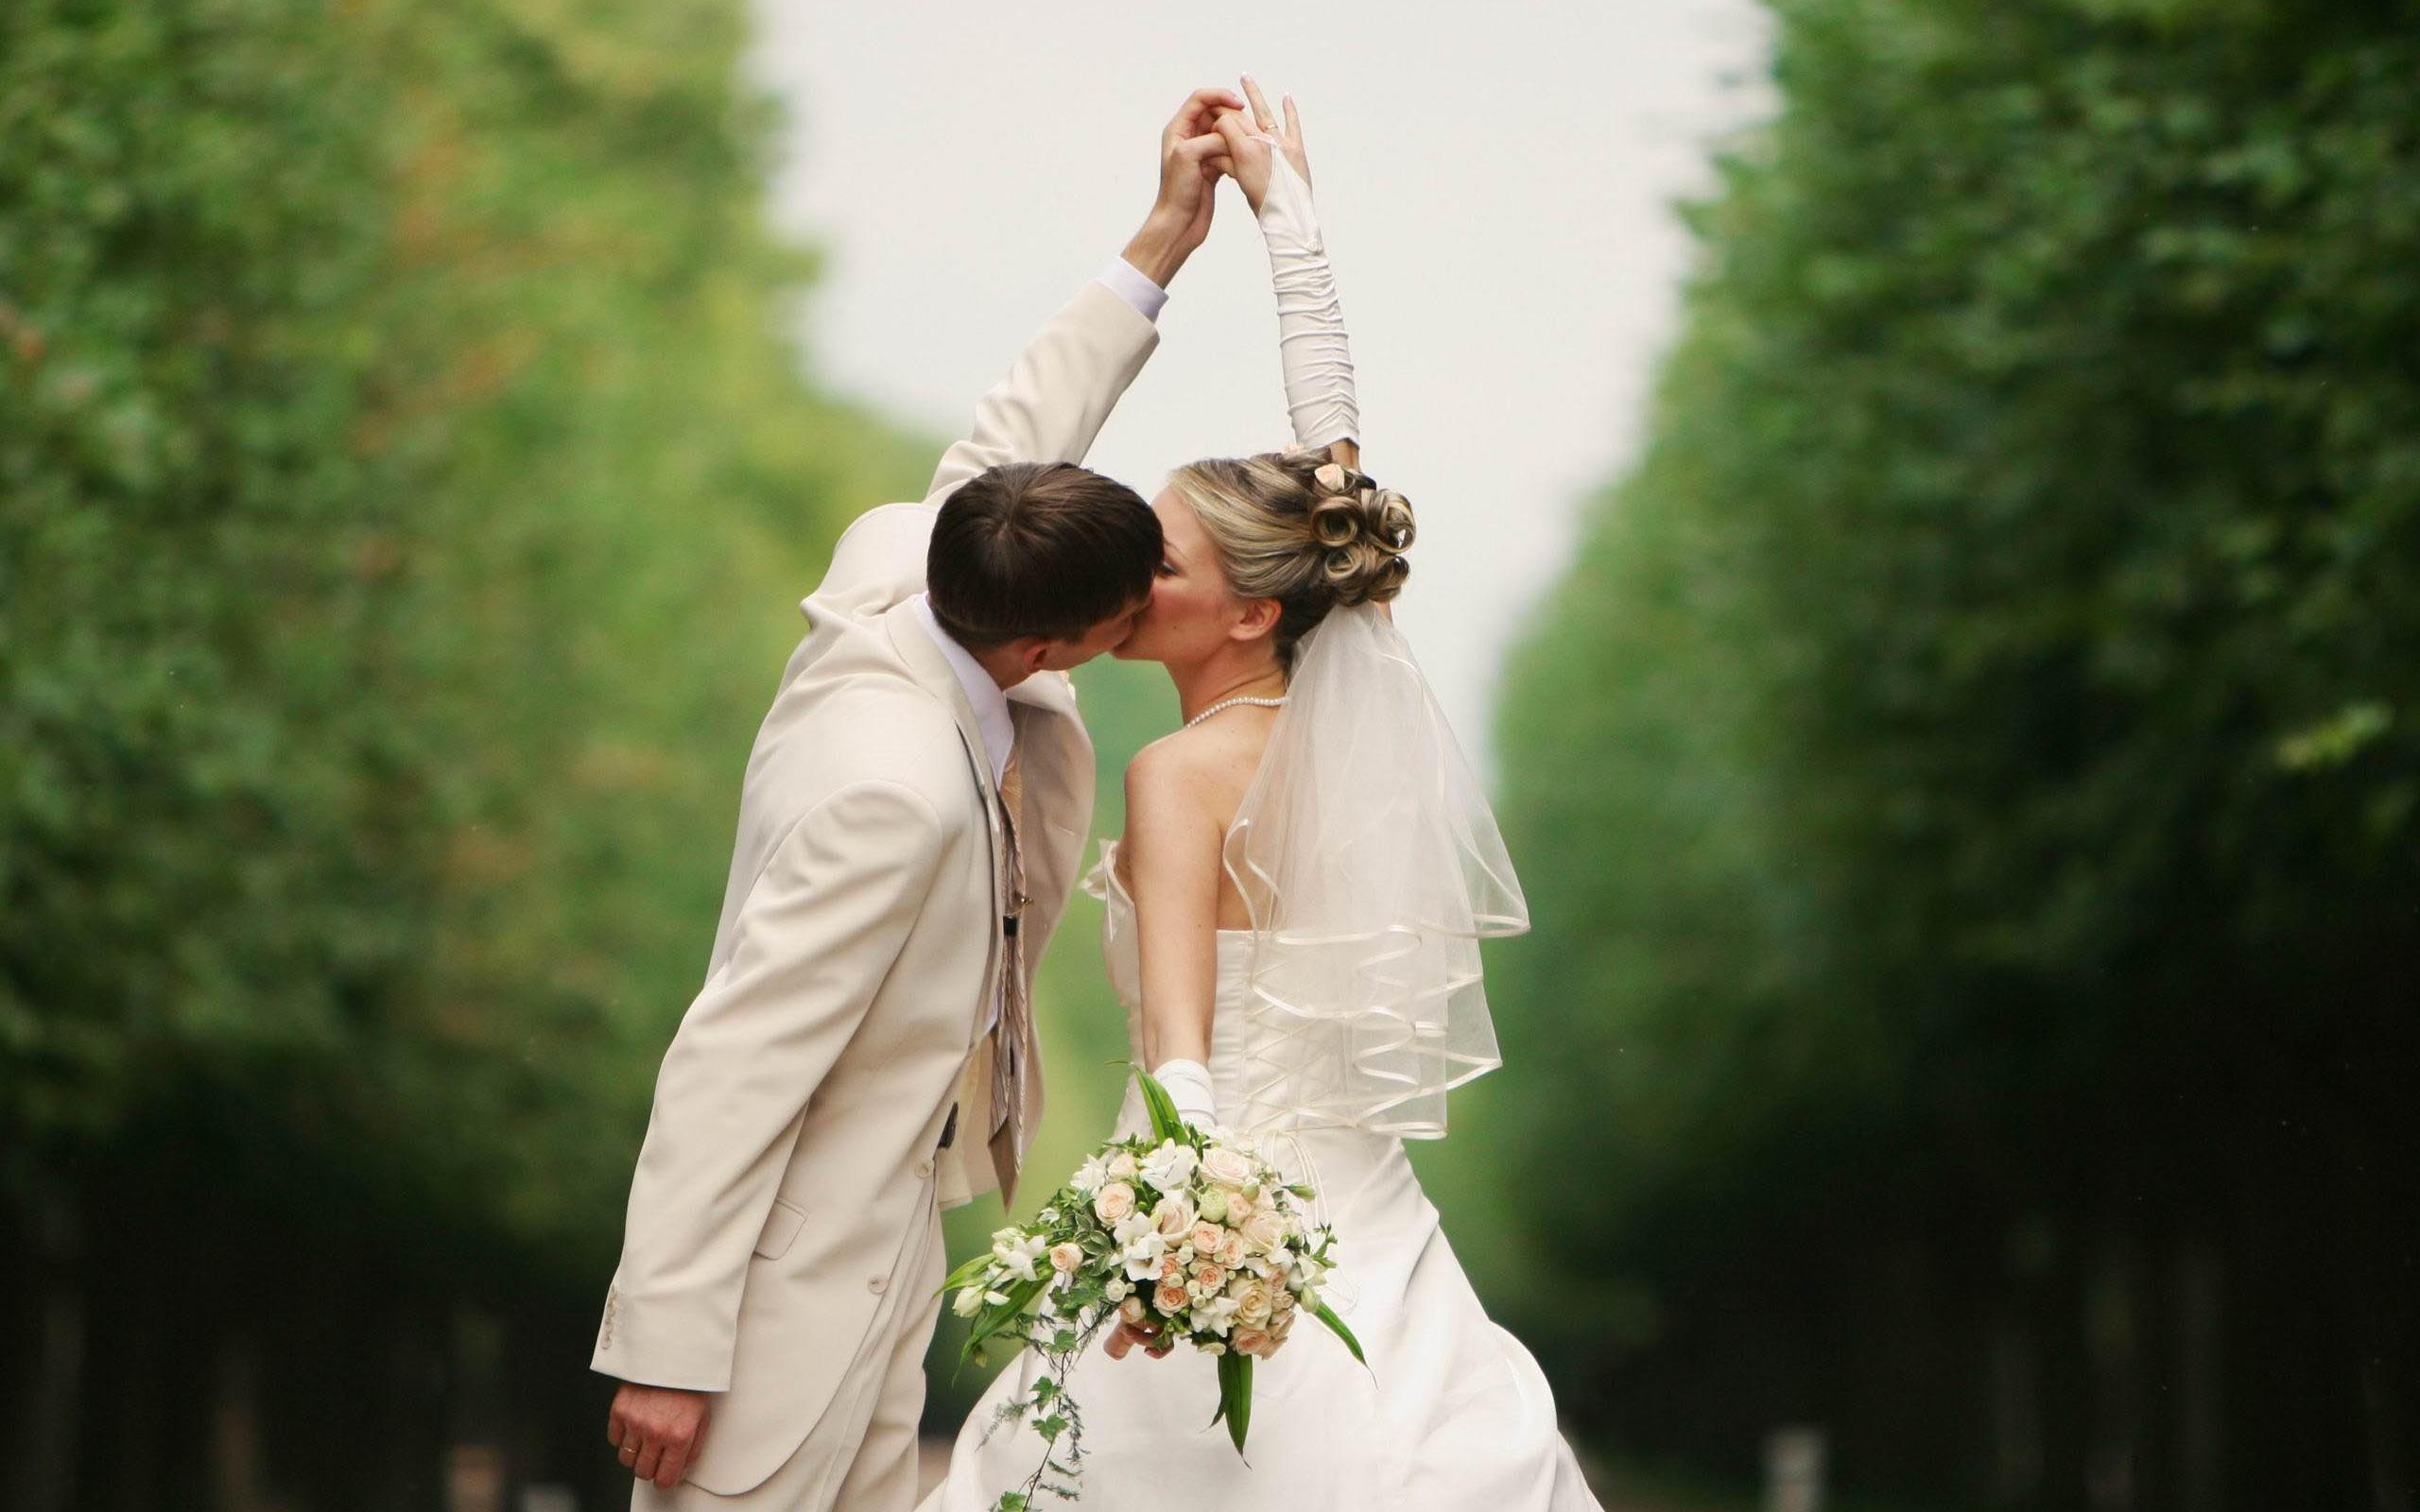 Wedding Photos Consultation